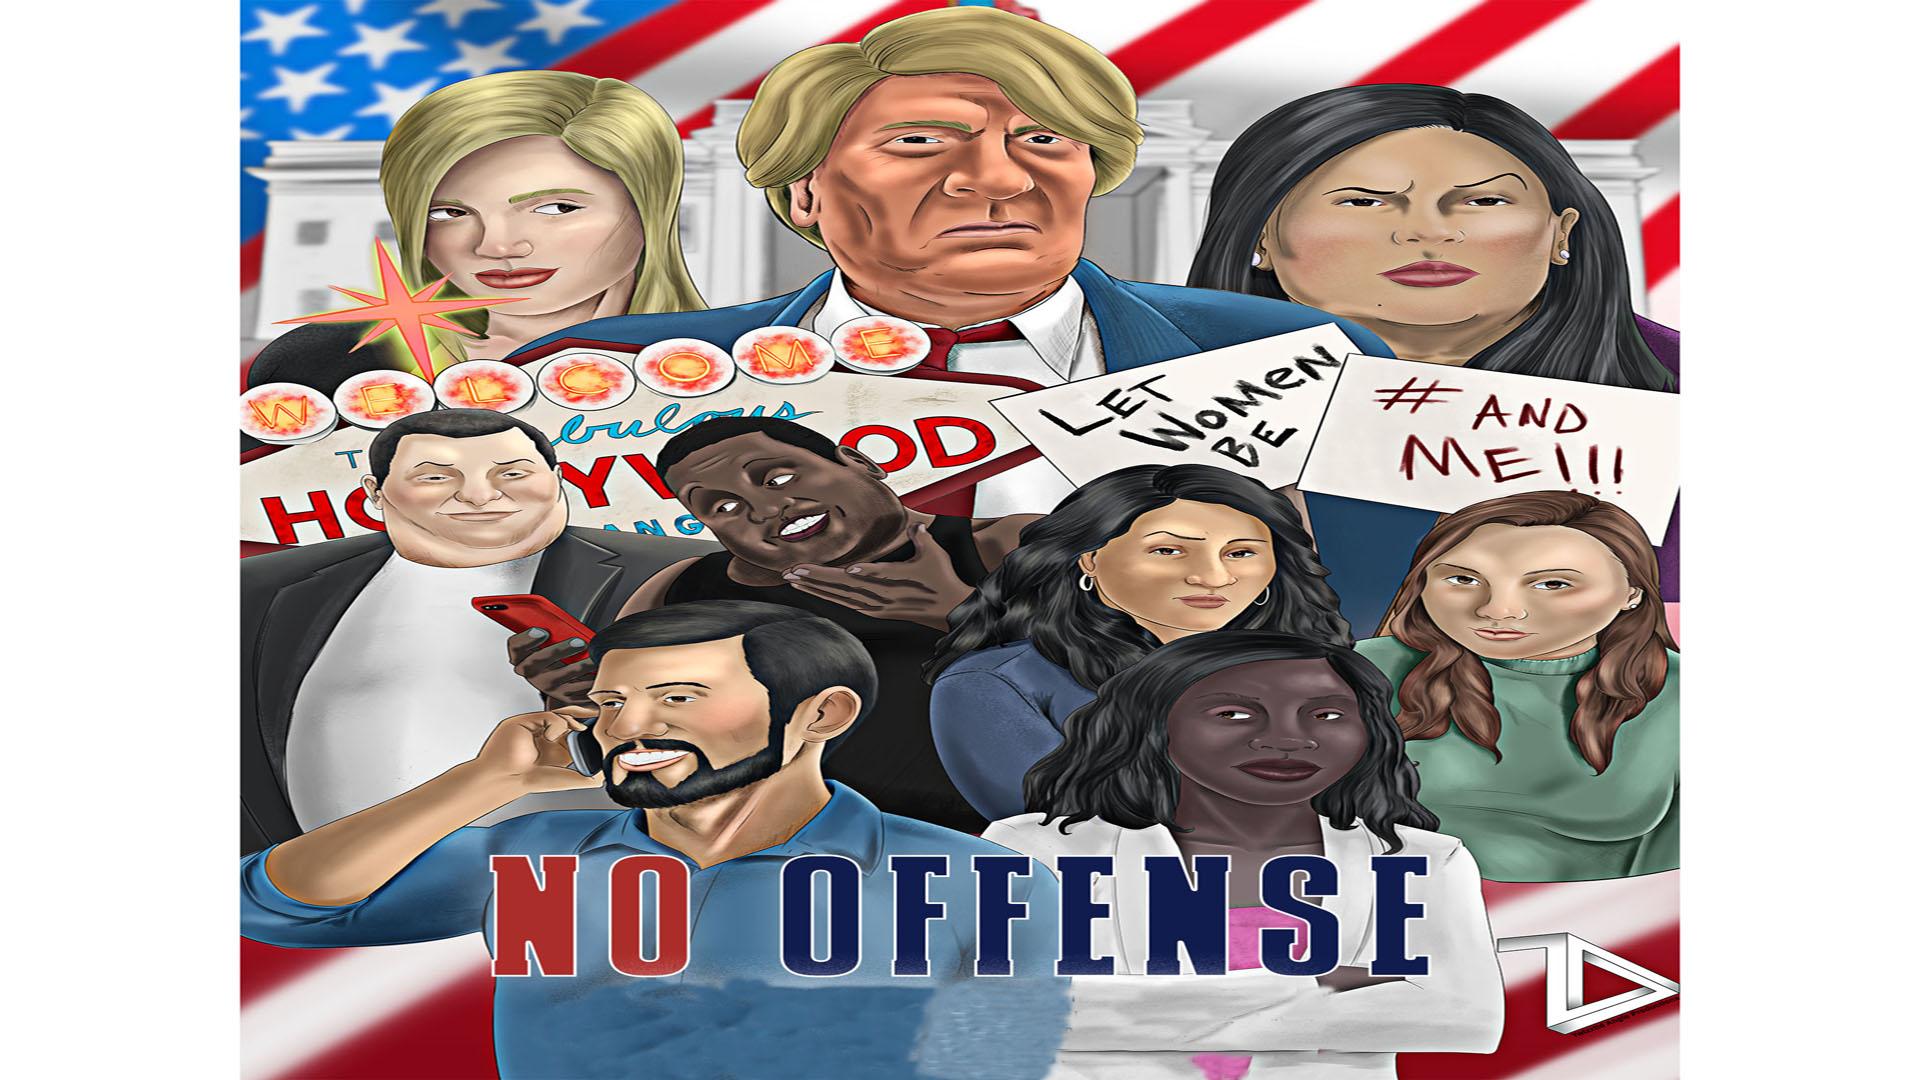 No Offense 9/28 @ 4pm PST